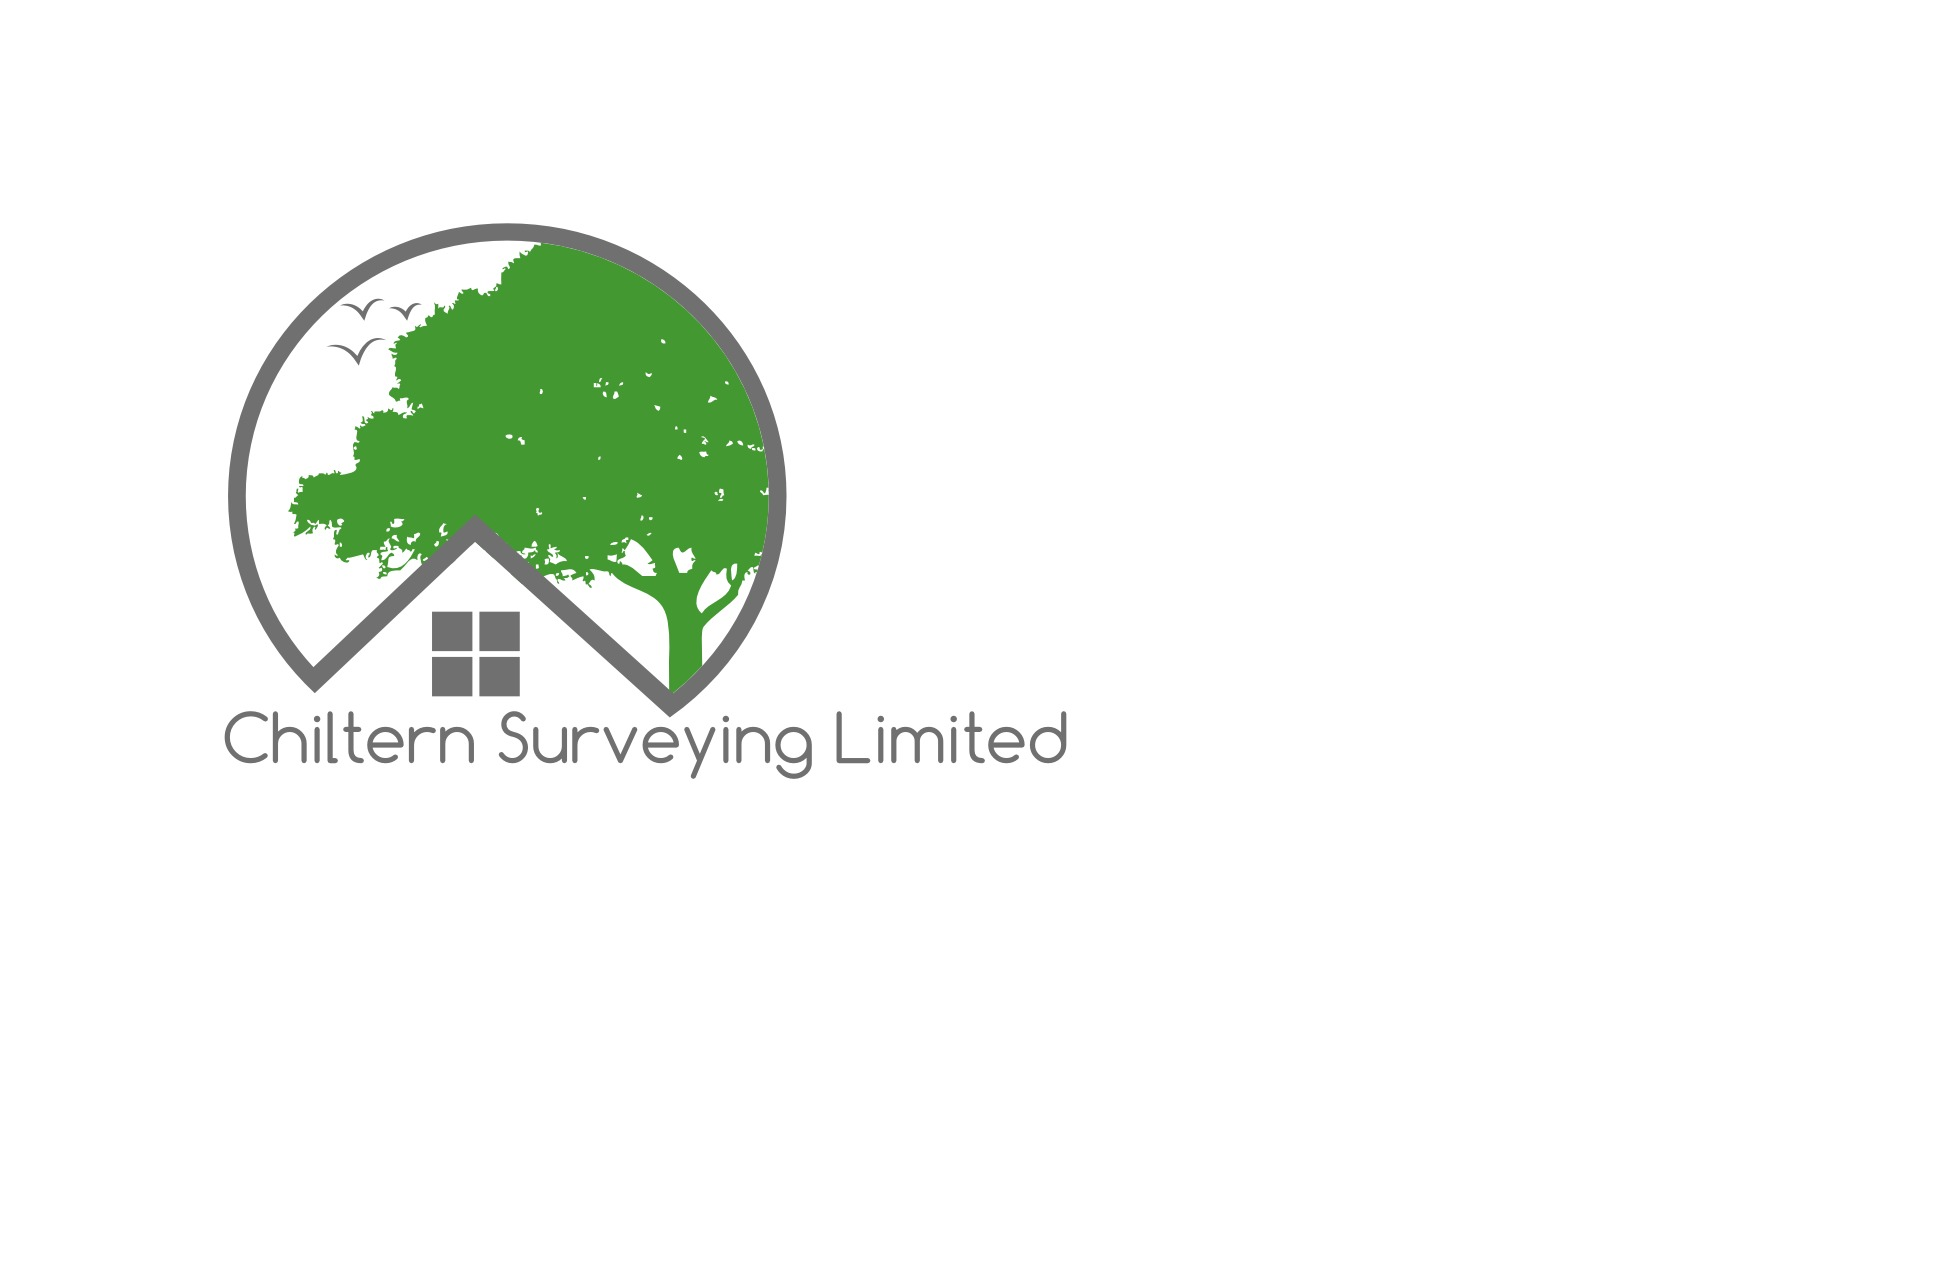 Chiltern-Surveying-Ltd